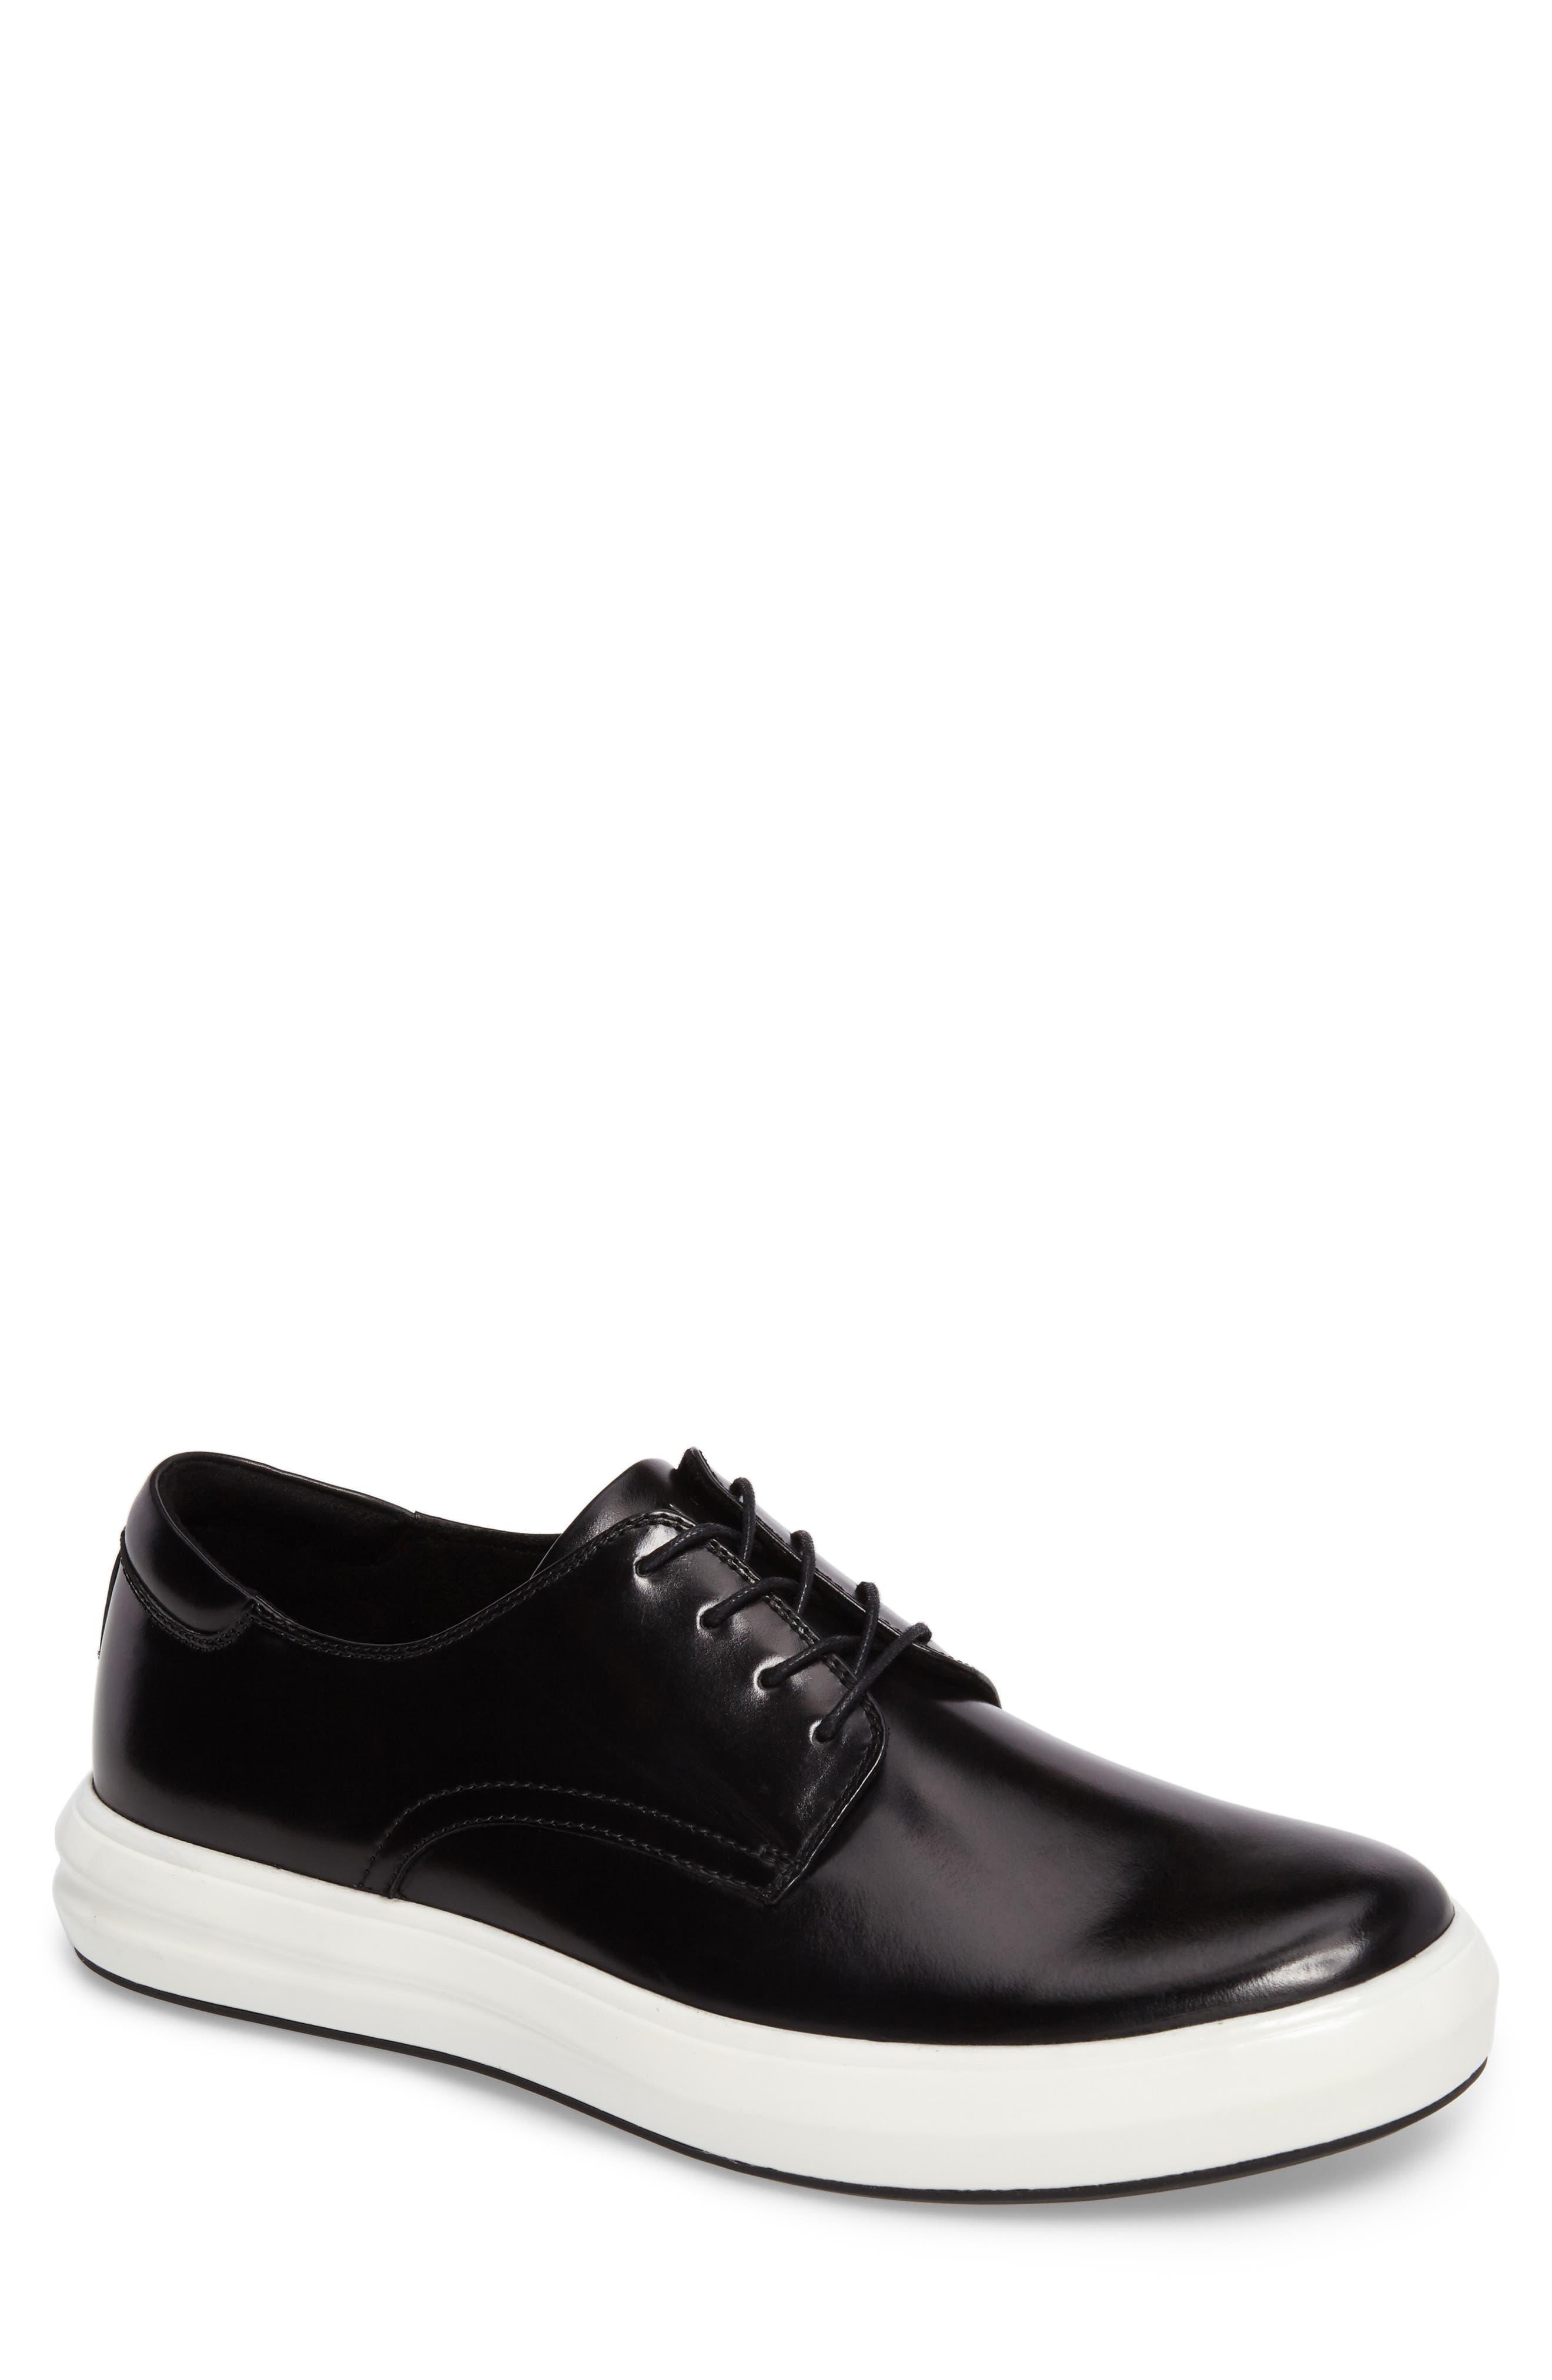 Main Image - Kenneth Cole New York Sneaker (Men)